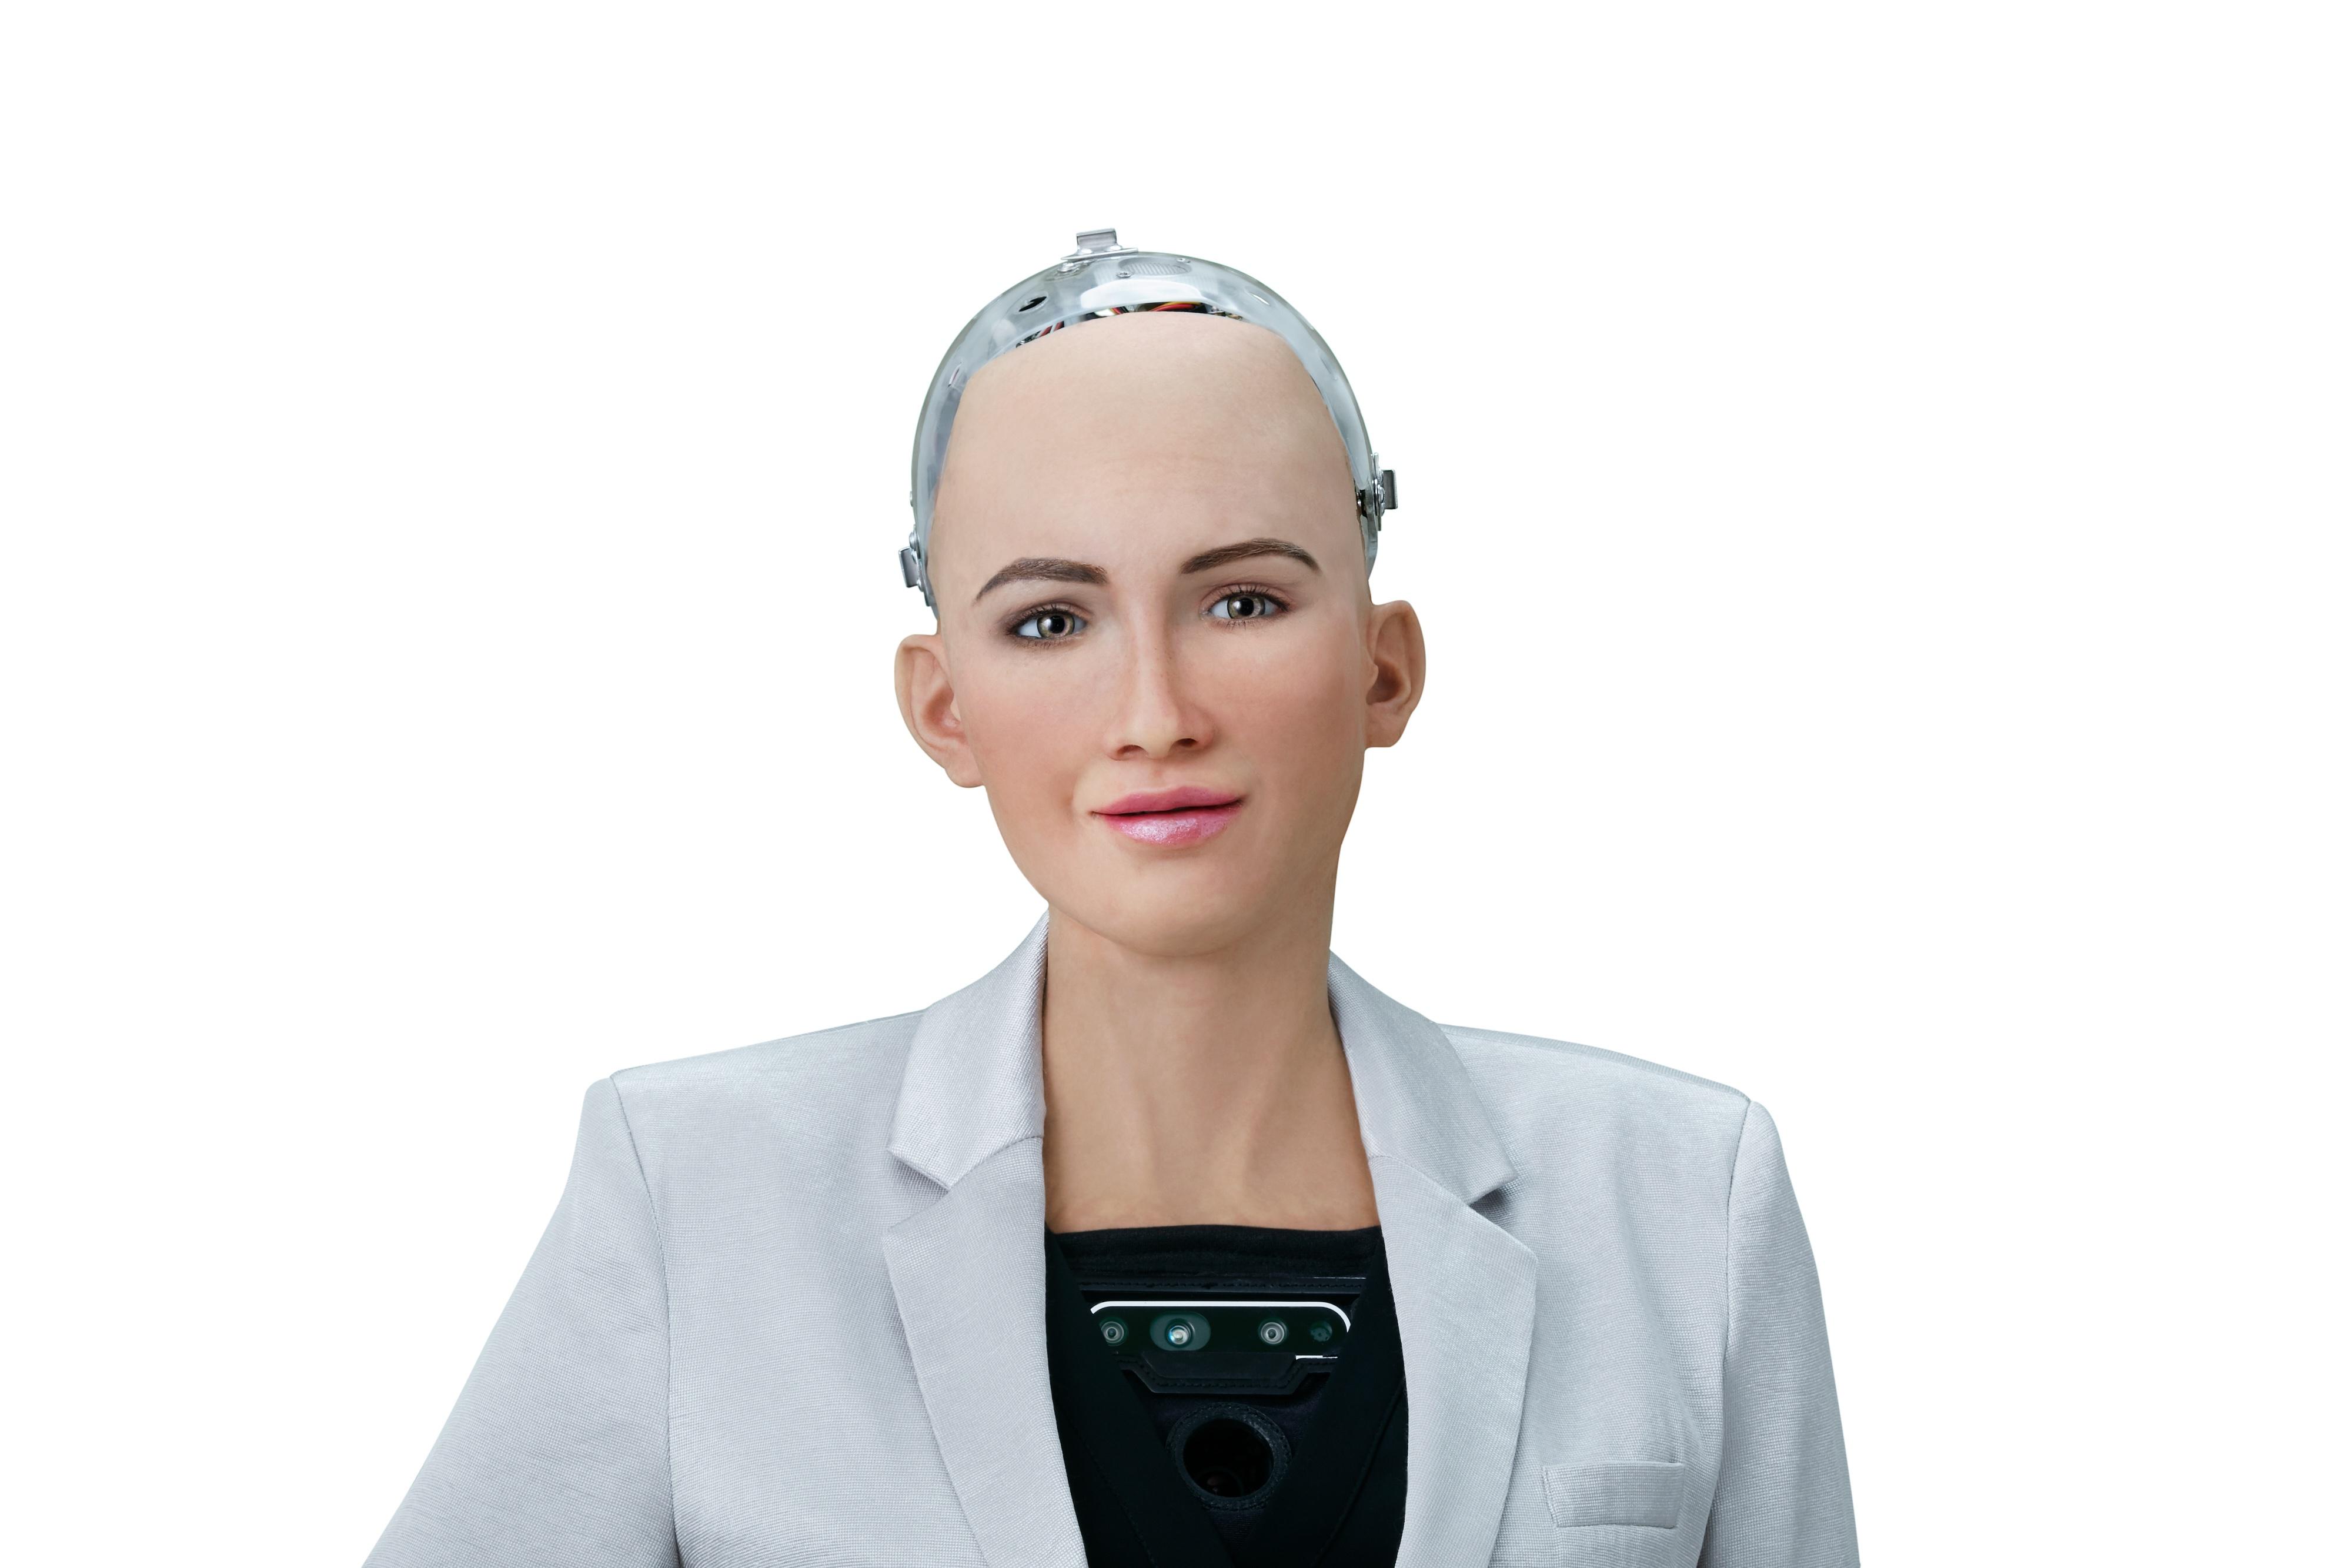 Sophia the Robot, Hanson Robotics' humanoid robot.